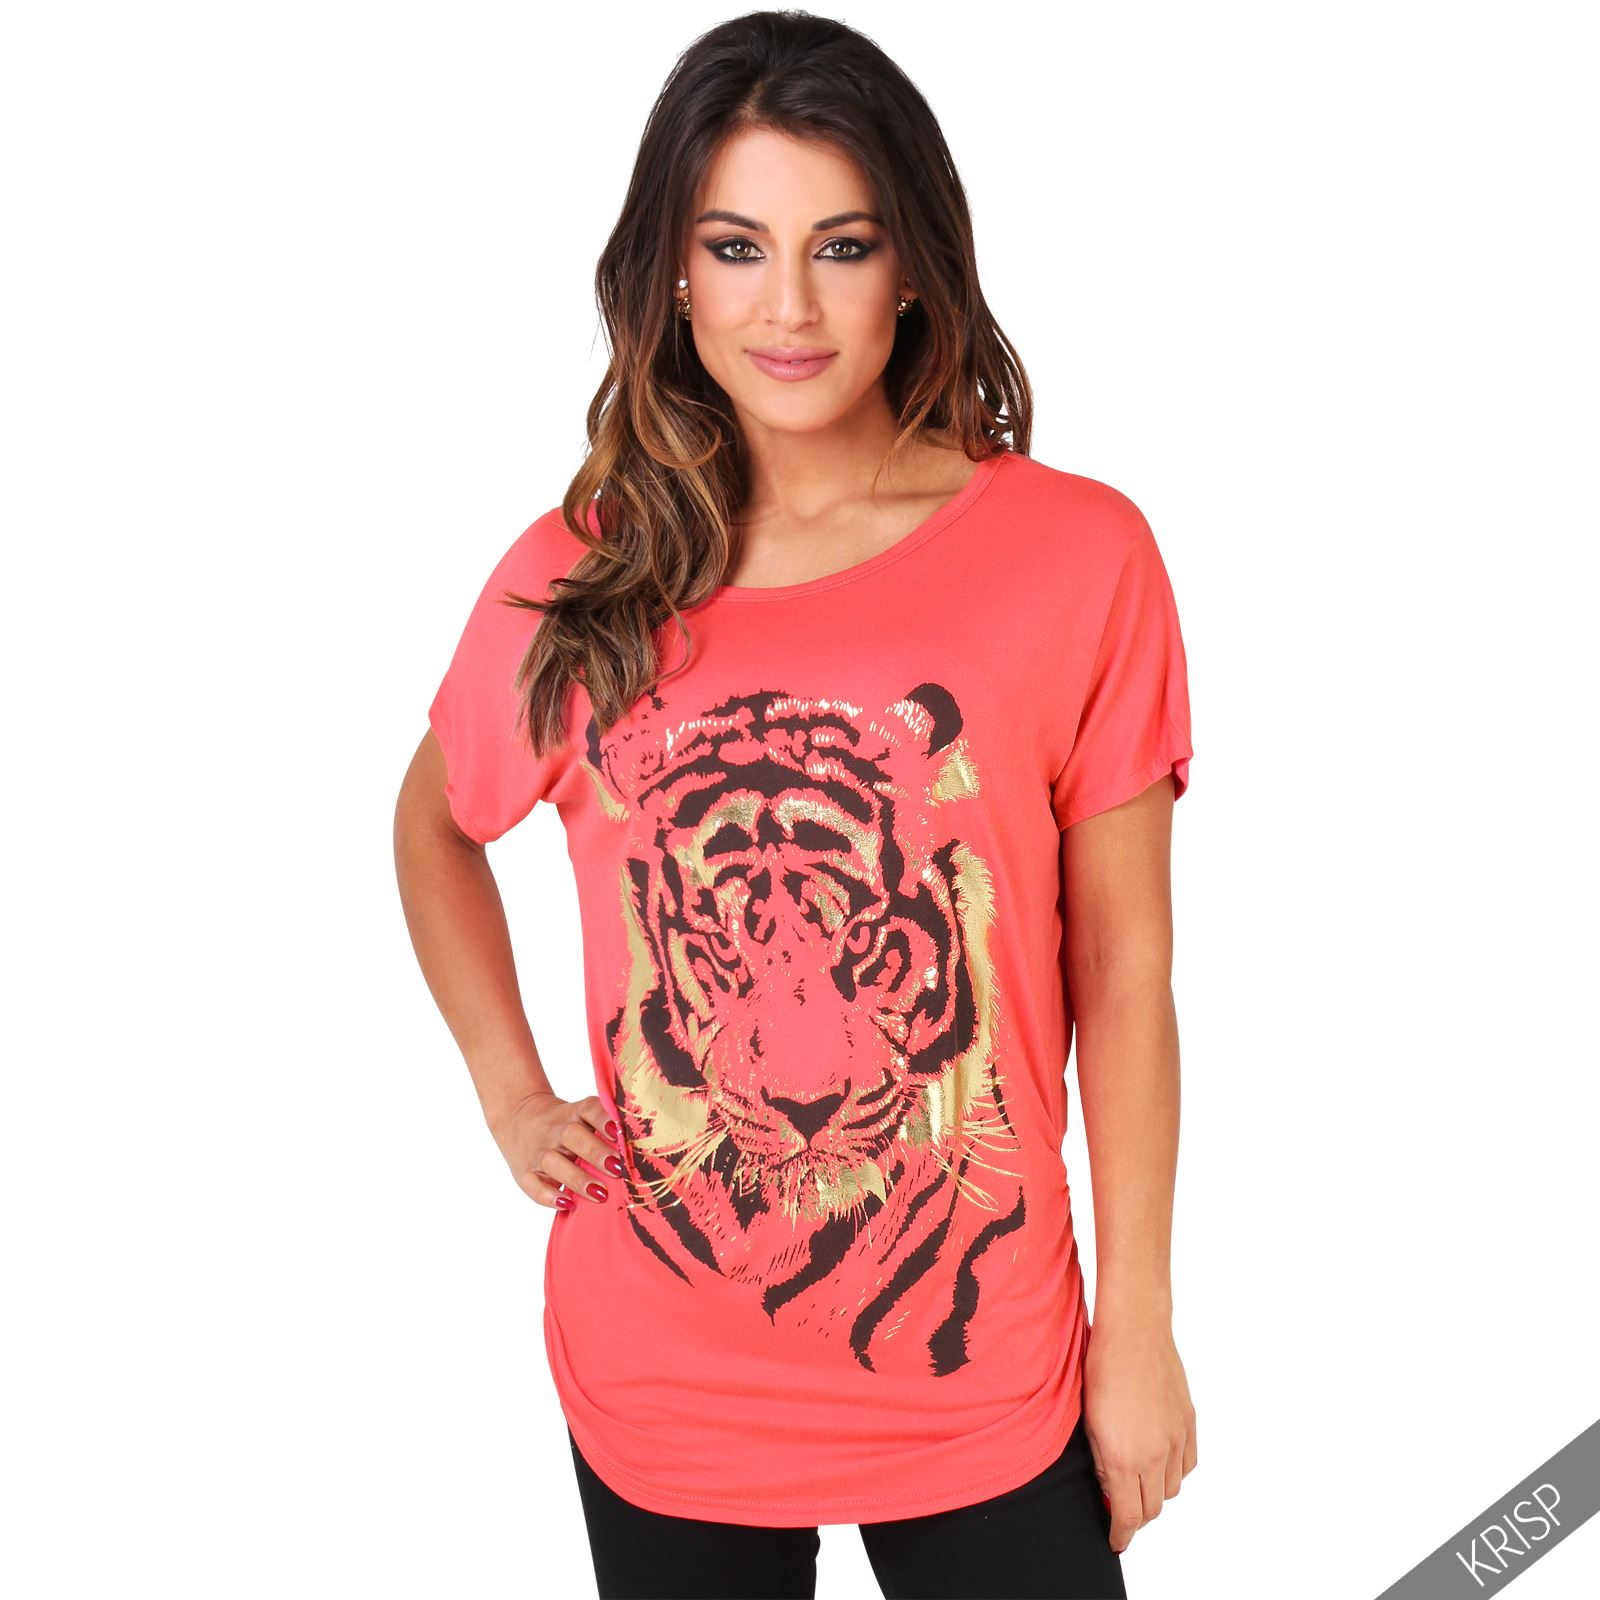 Womens-Oversized-Batwing-T-Shirt-Ladies-Baggy-Animal-Tiger-Blouse-Print-Top thumbnail 7